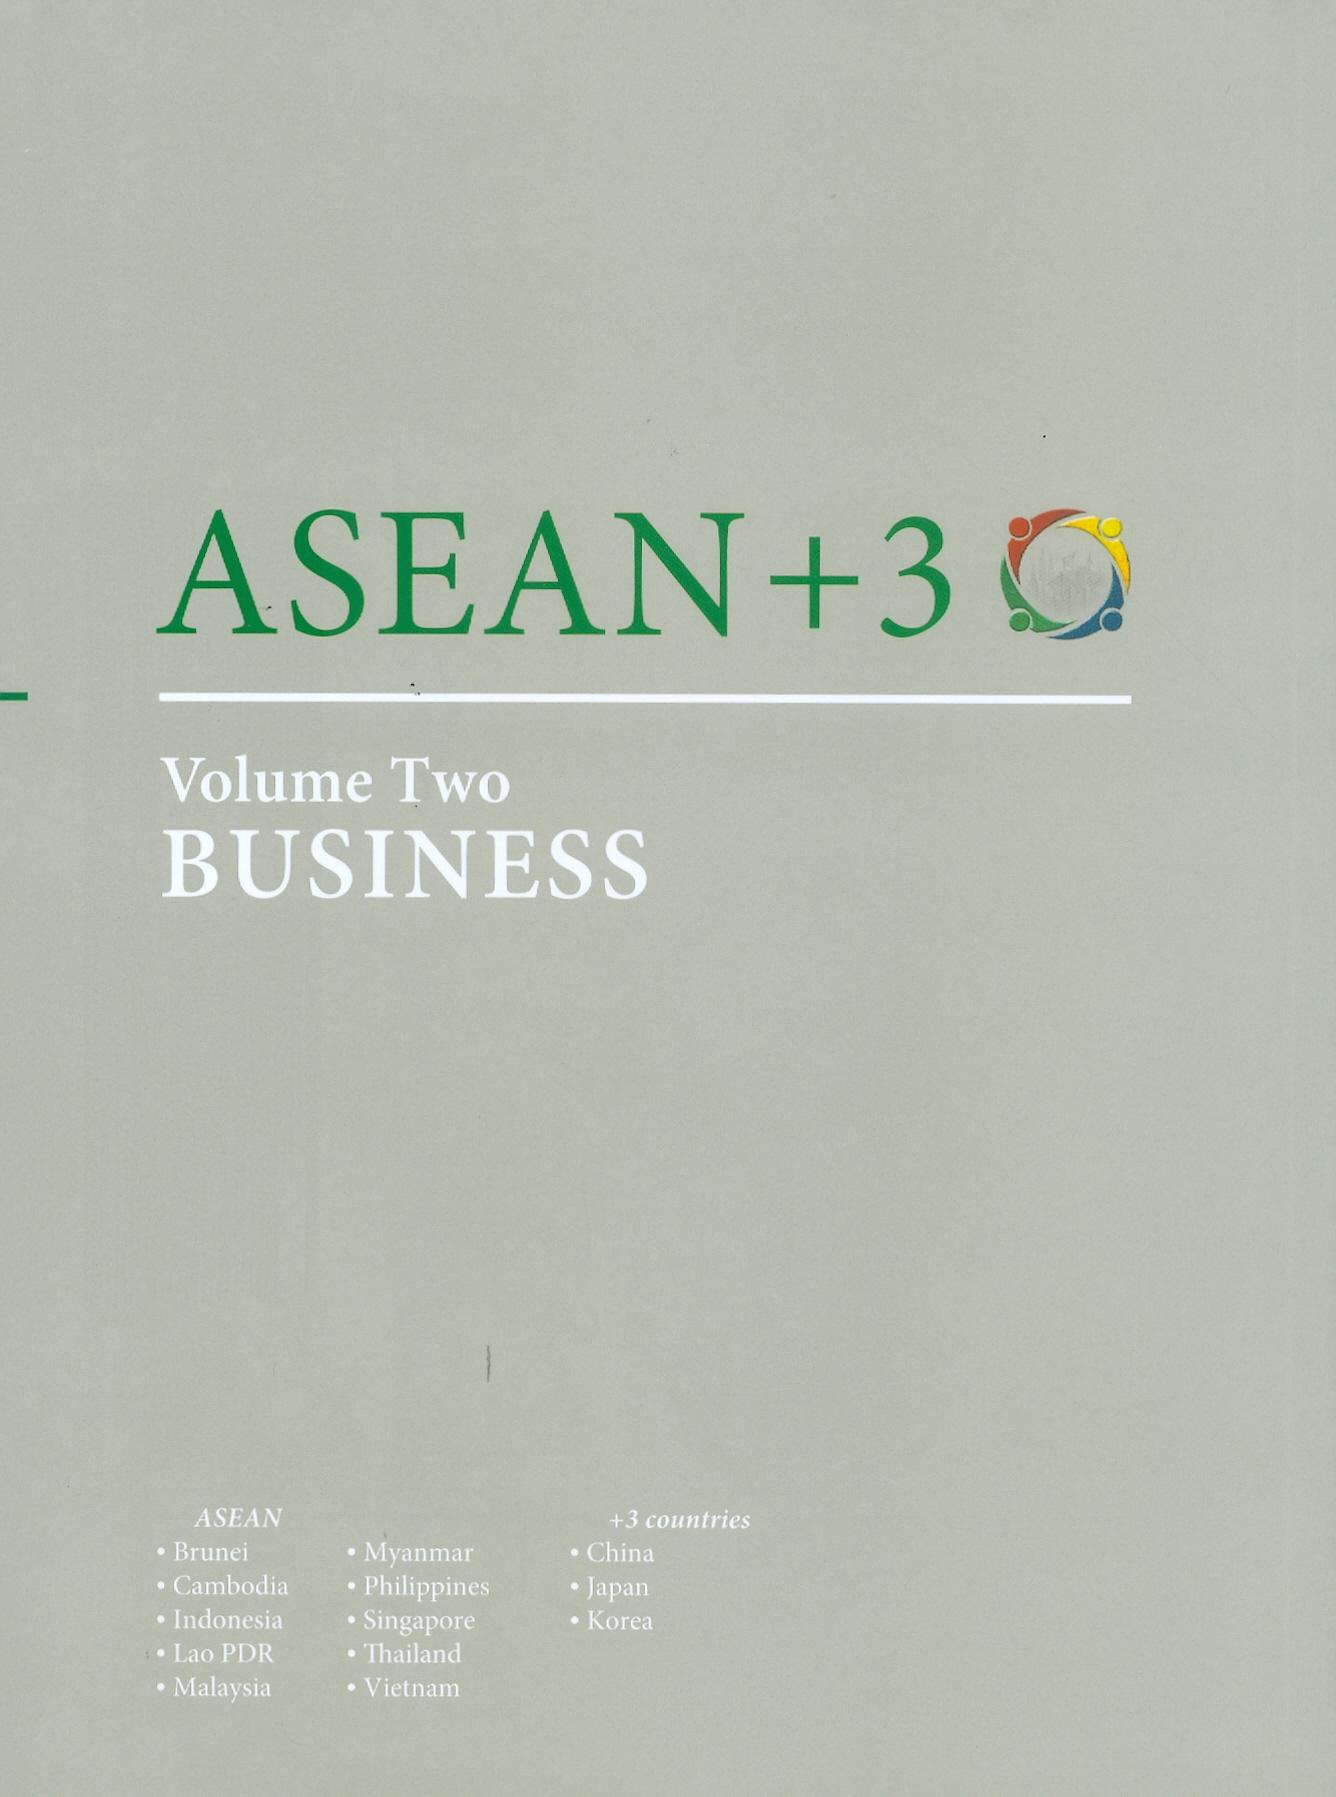 business0001.jpg